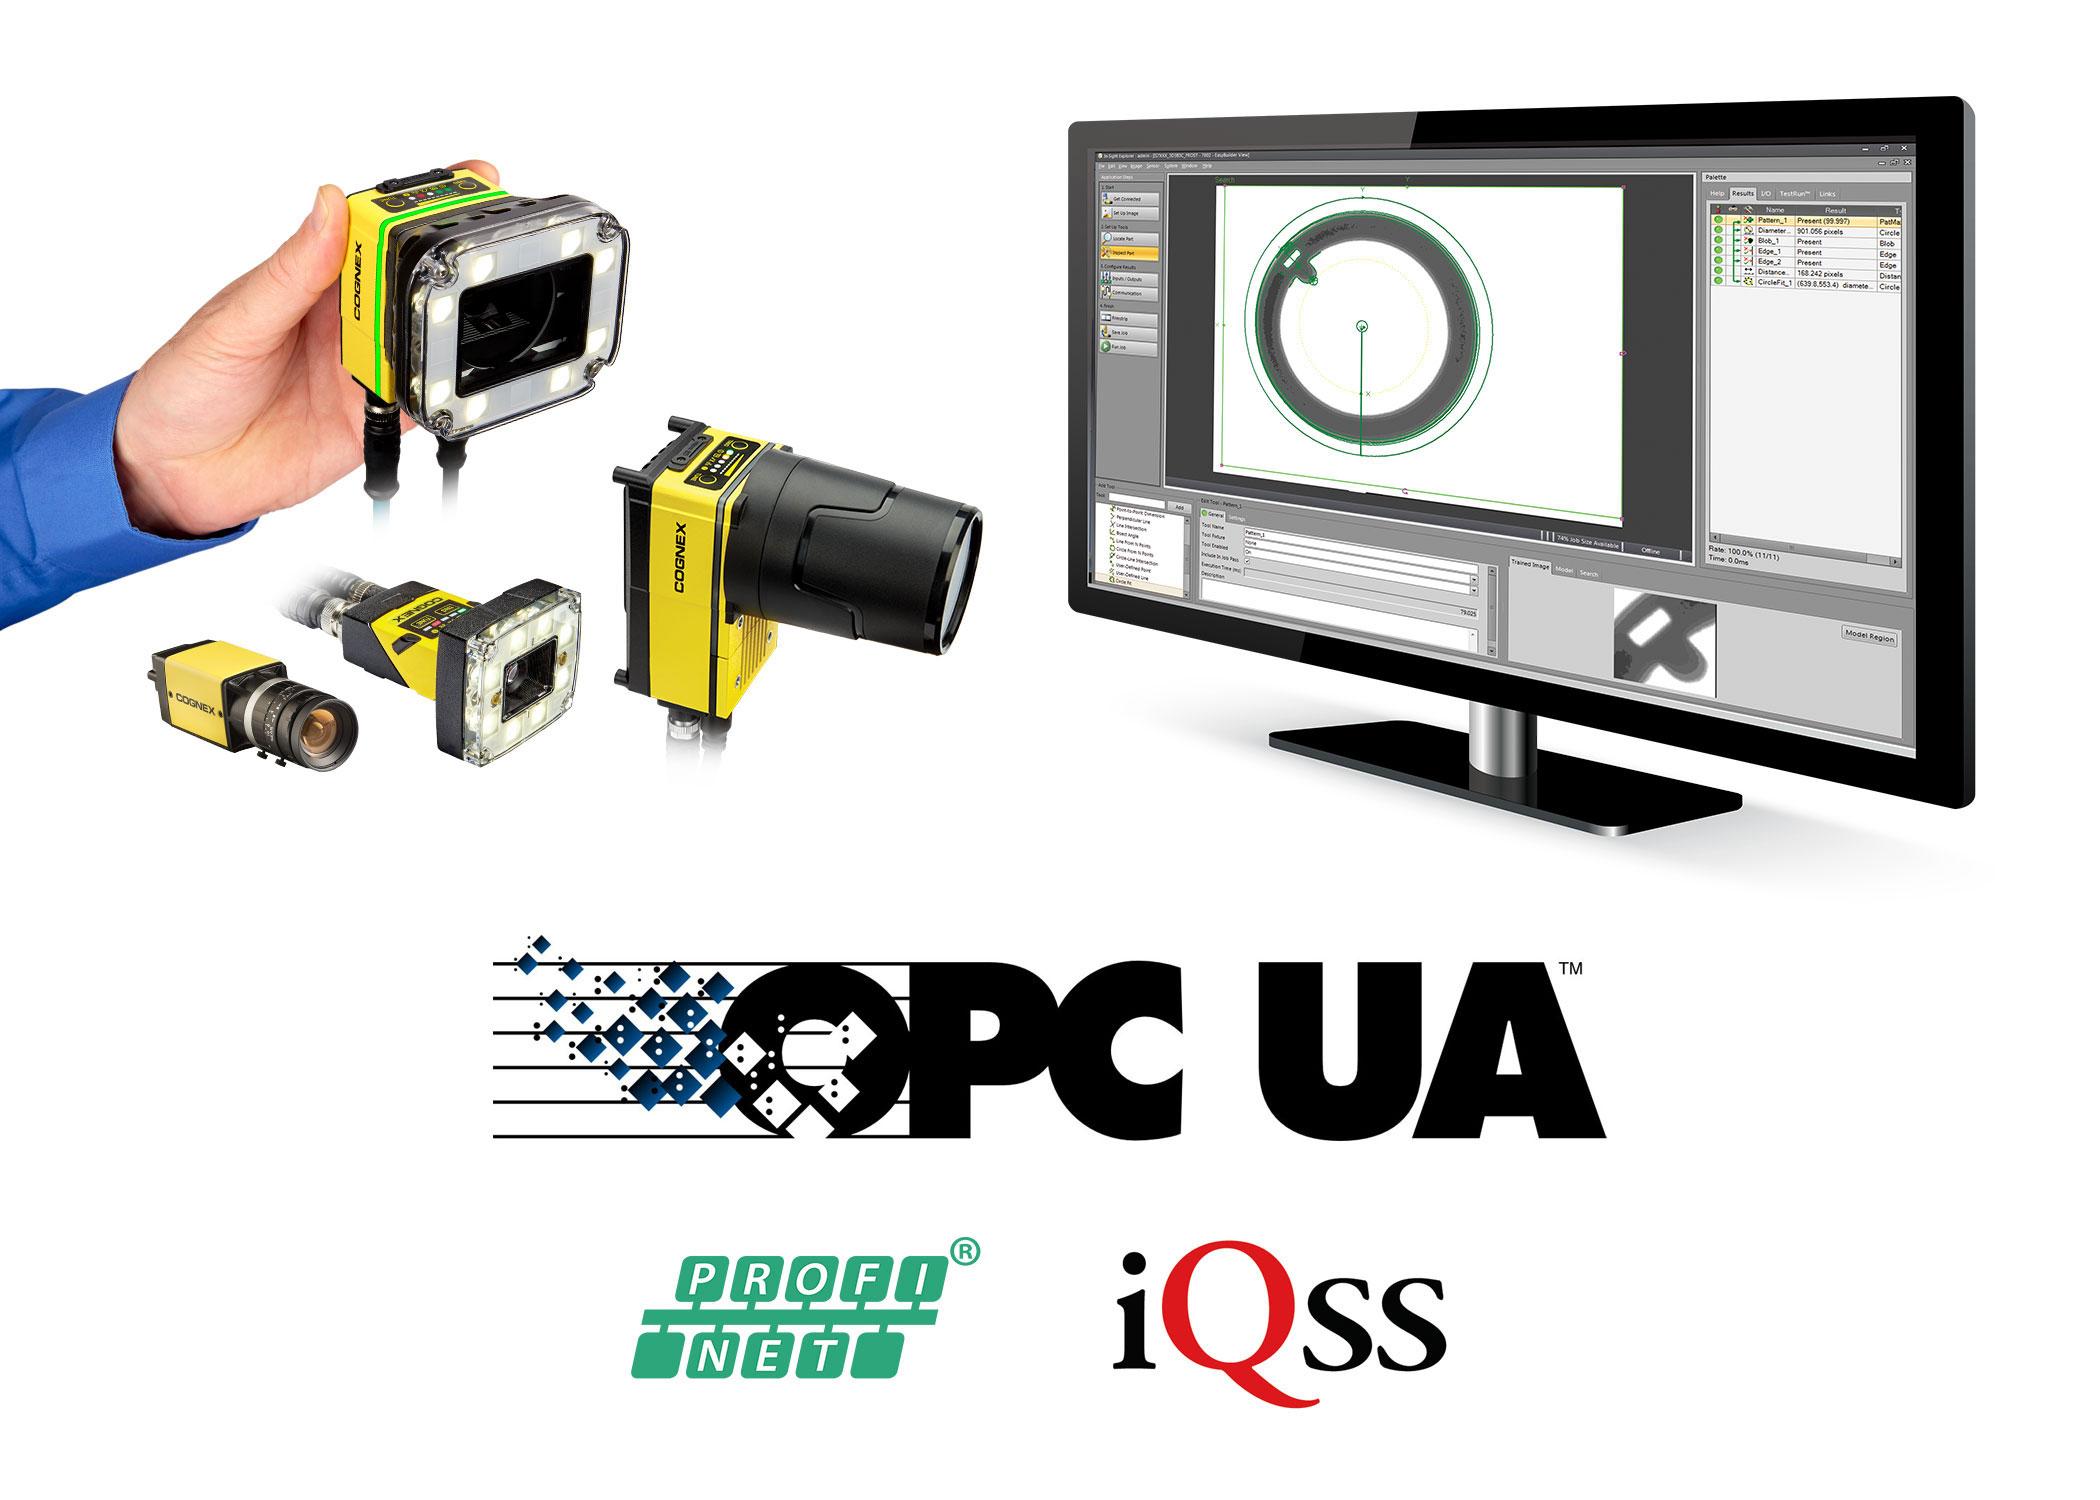 OPC-UA_PROFINET-Class-B_iQSS_Press-Release